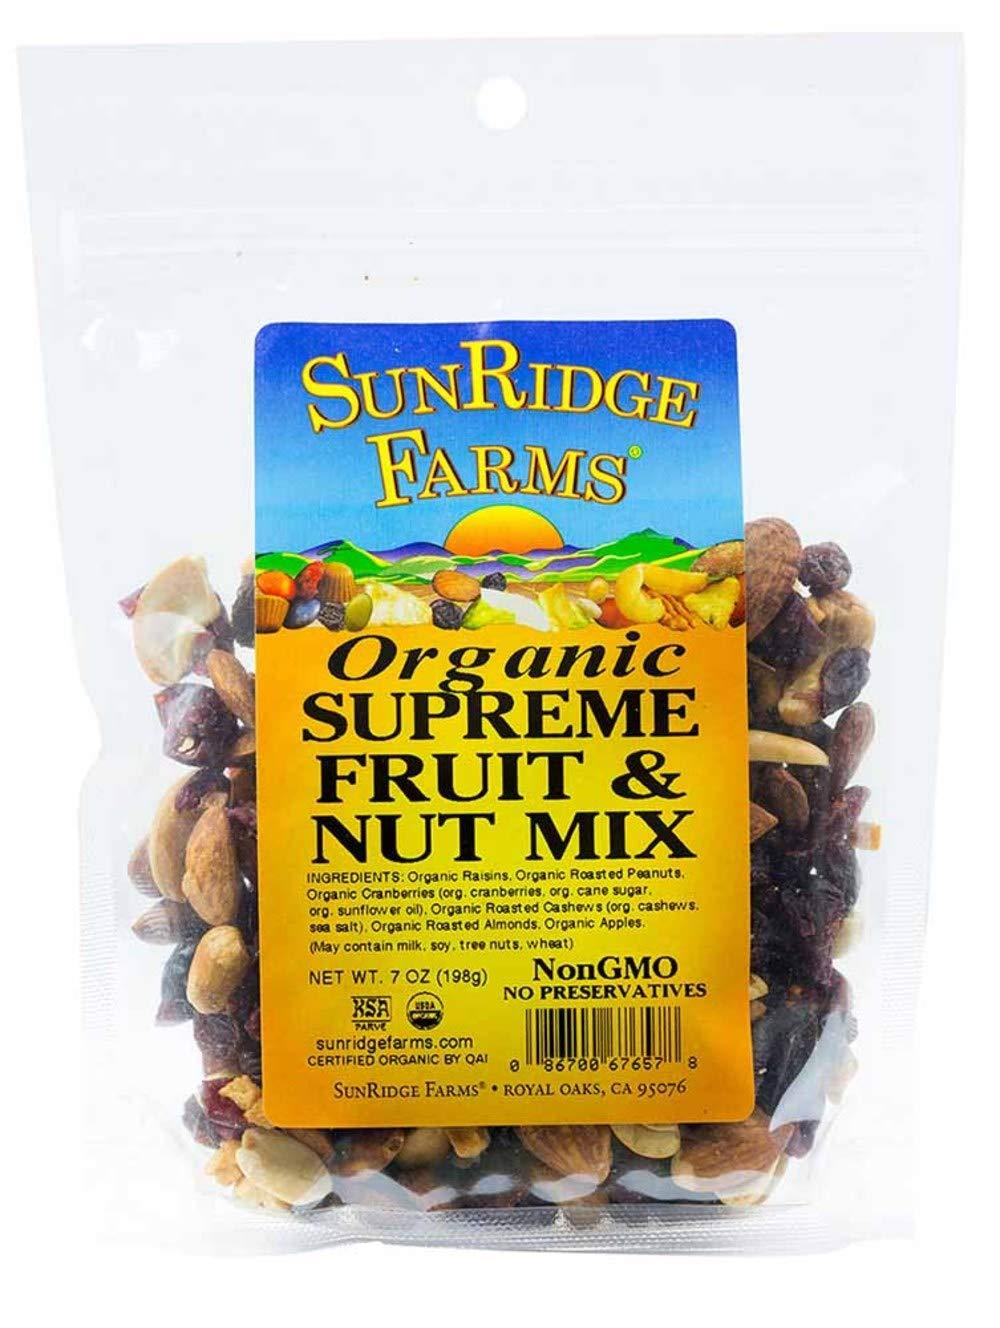 SunRidge Farms Organic Supreme Fruit & Nut Mix NonGMO Verified 7 Ounce Bag (Pack of 12)